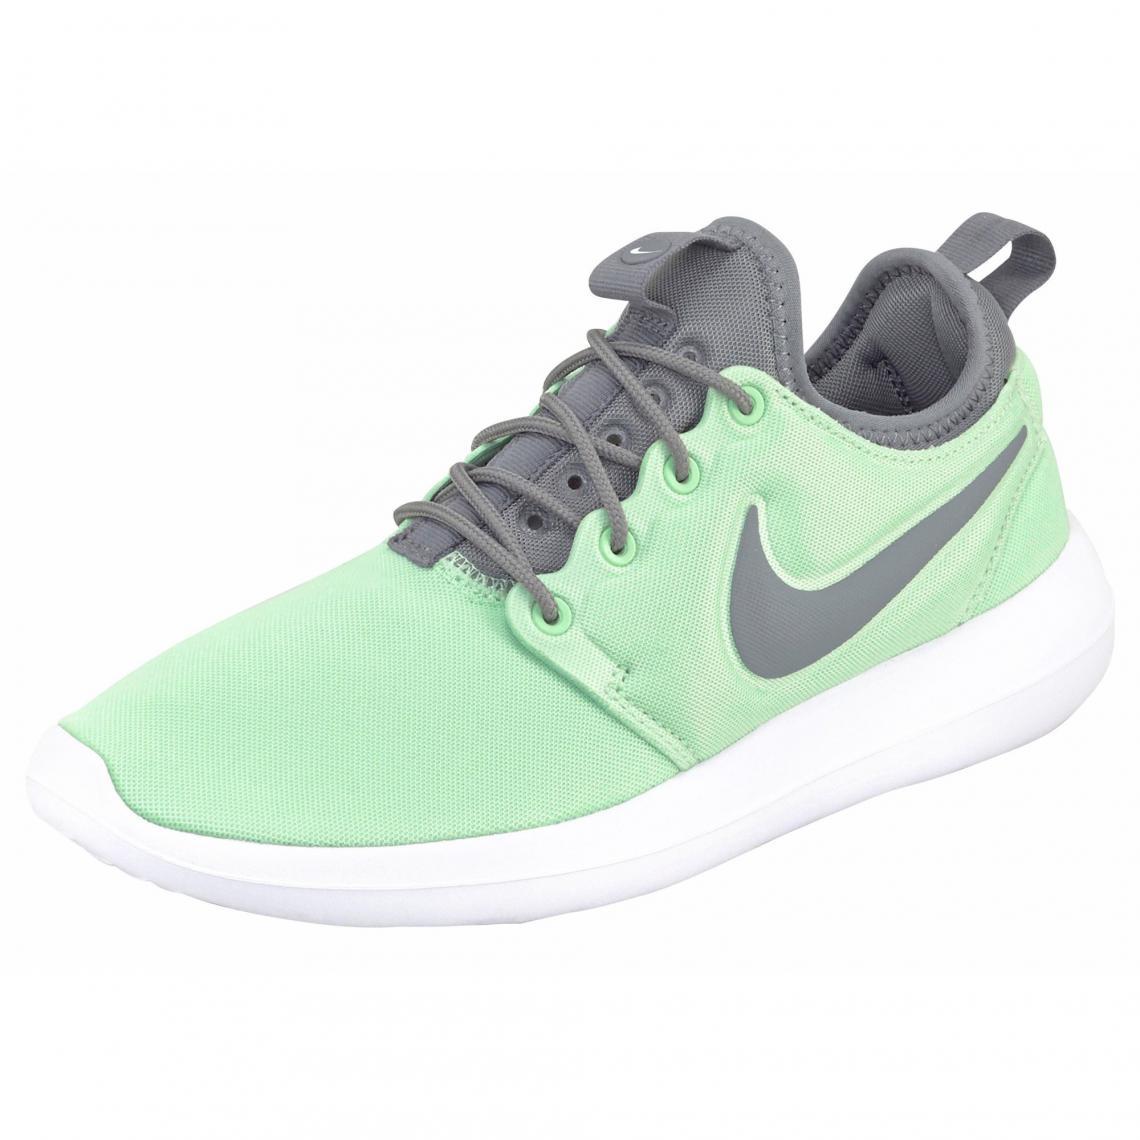 Roshe Vert3 Suisses Two Chaussures De Running Nike Femme wO8kn0XP